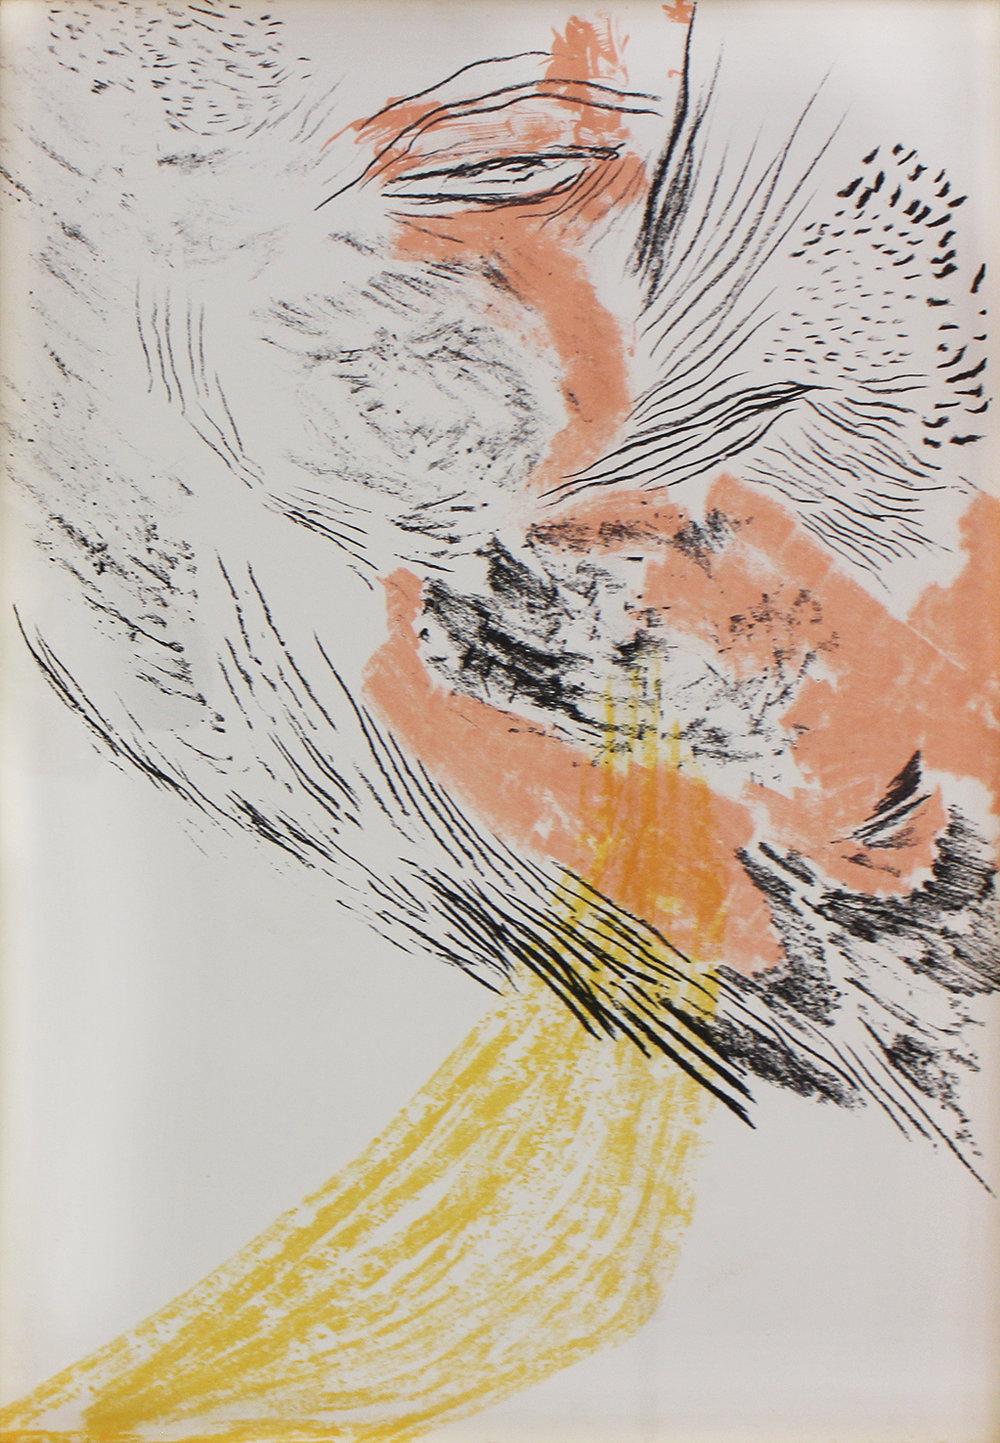 Gabriela Orzechowski  Time Spent Bewildered  Screenprint on Fabriano  67 x 47 cm